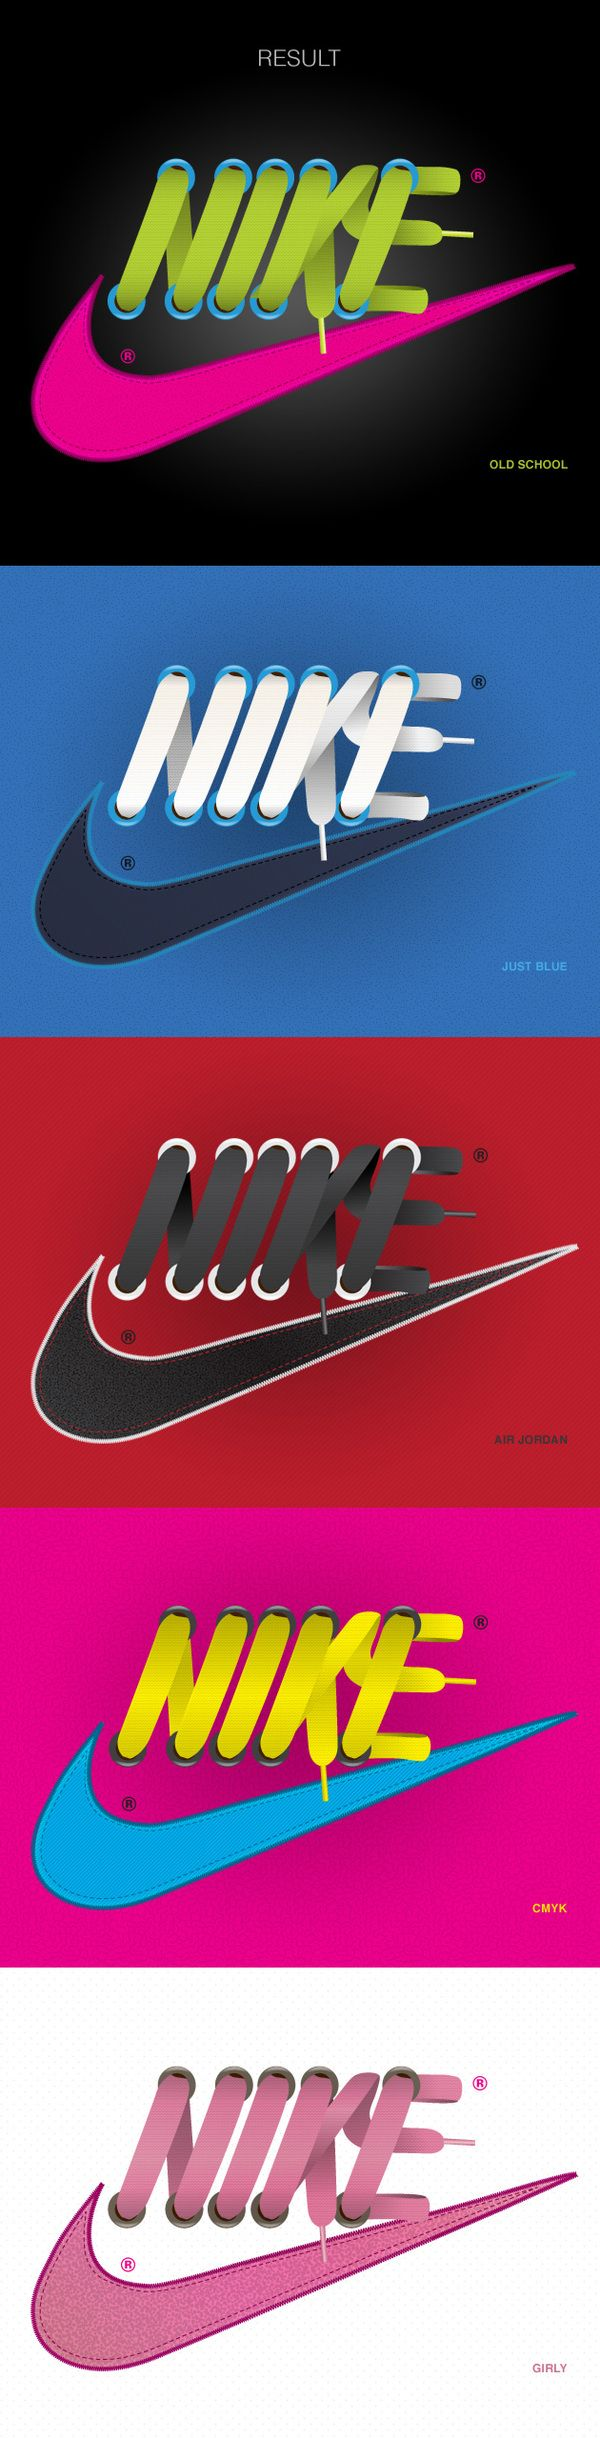 Typeface - NIKE Laces #design